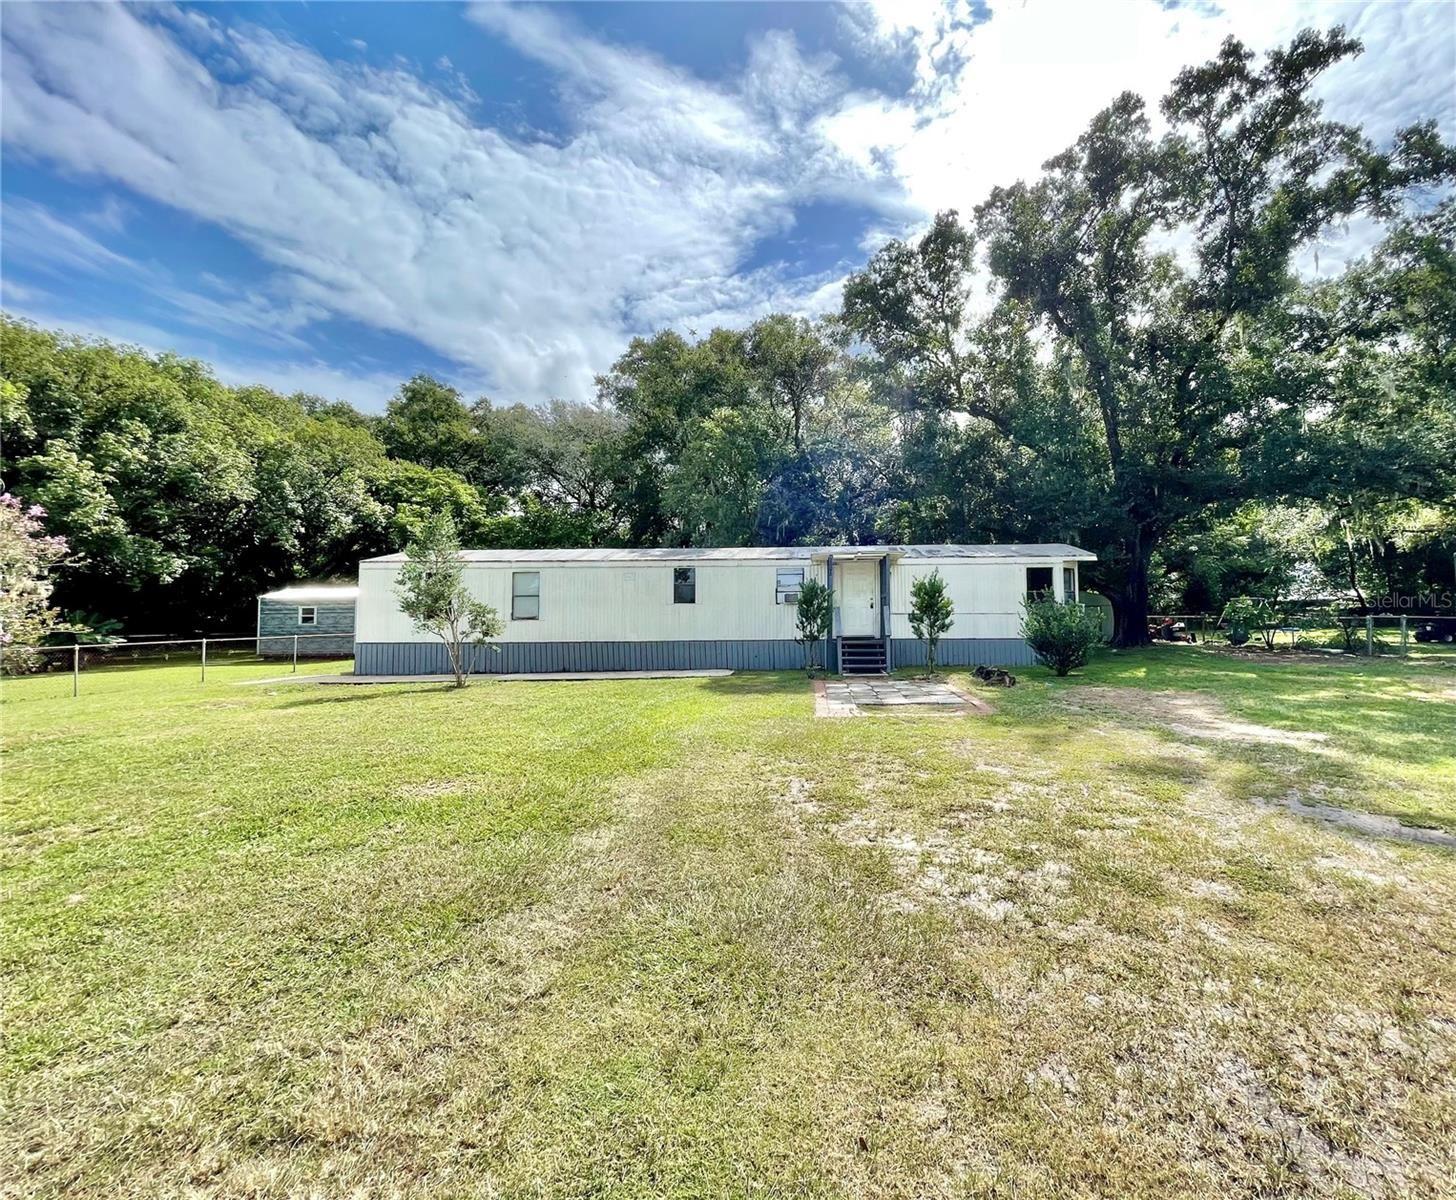 2002 HAWK GRIFFIN ROAD, Plant City, FL 33565 - MLS#: T3326360